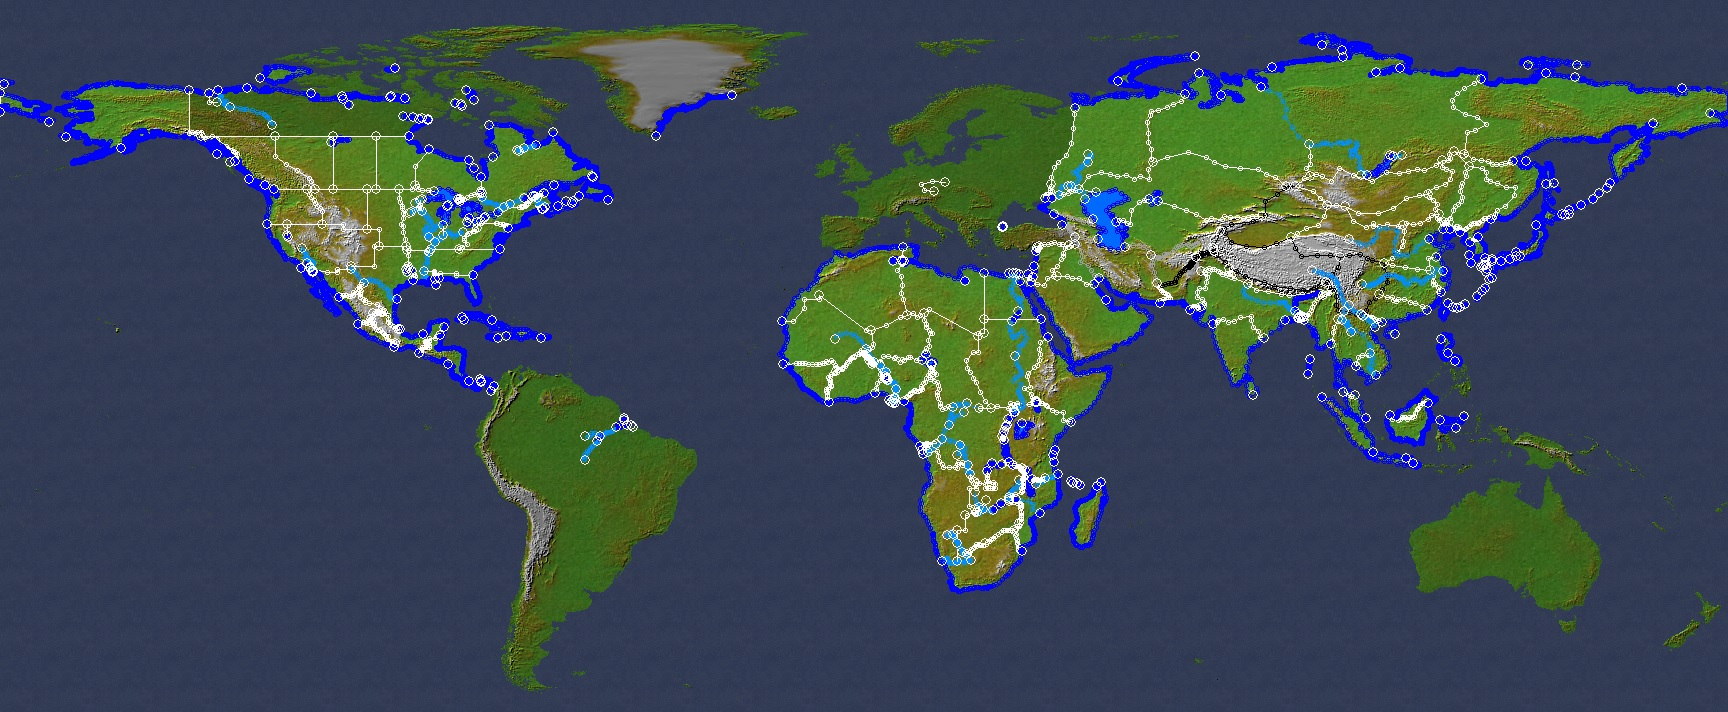 world5-1.jpg